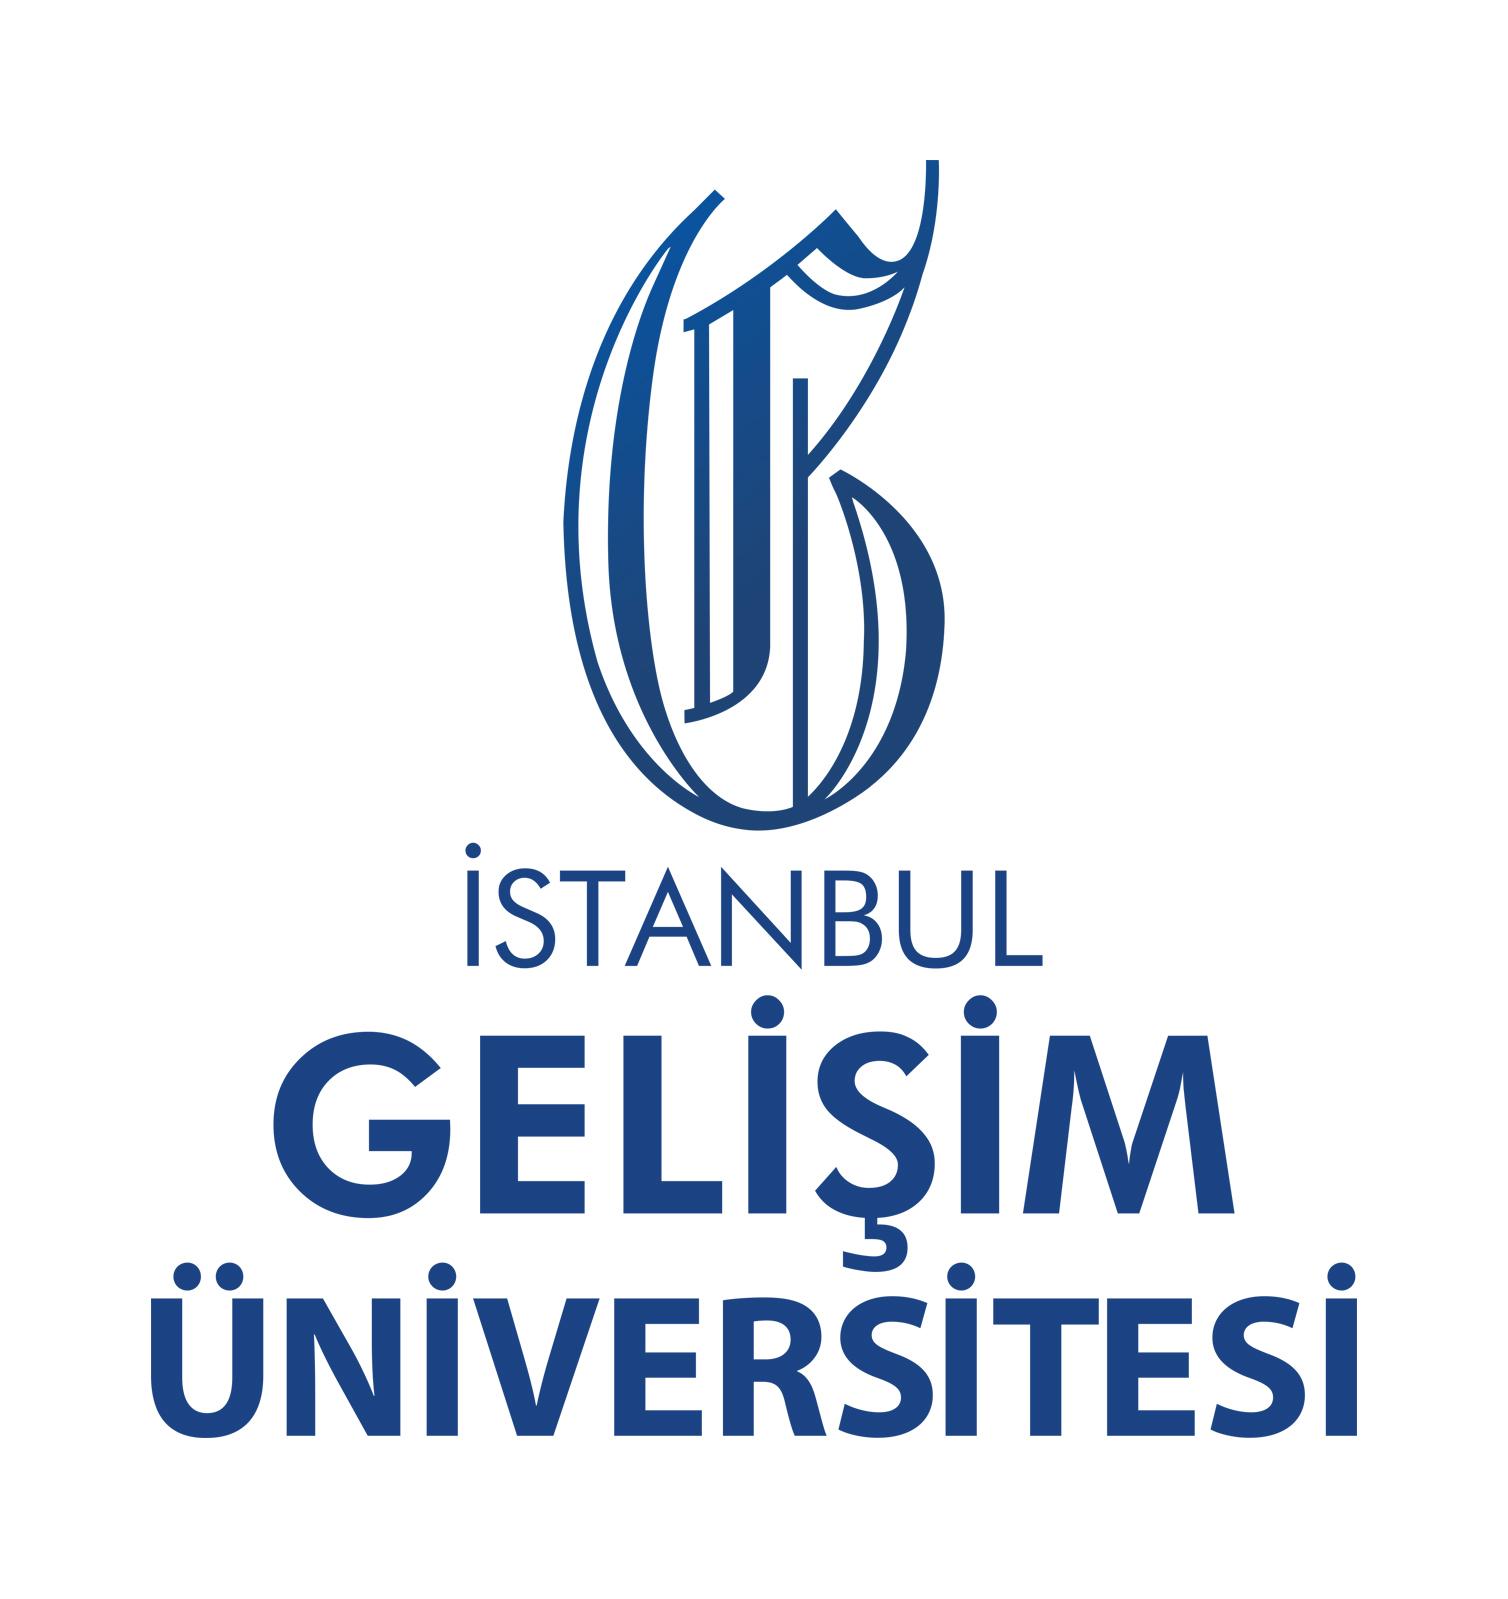 TUAS | ISTANBUL GELISIM UNIVERSITY